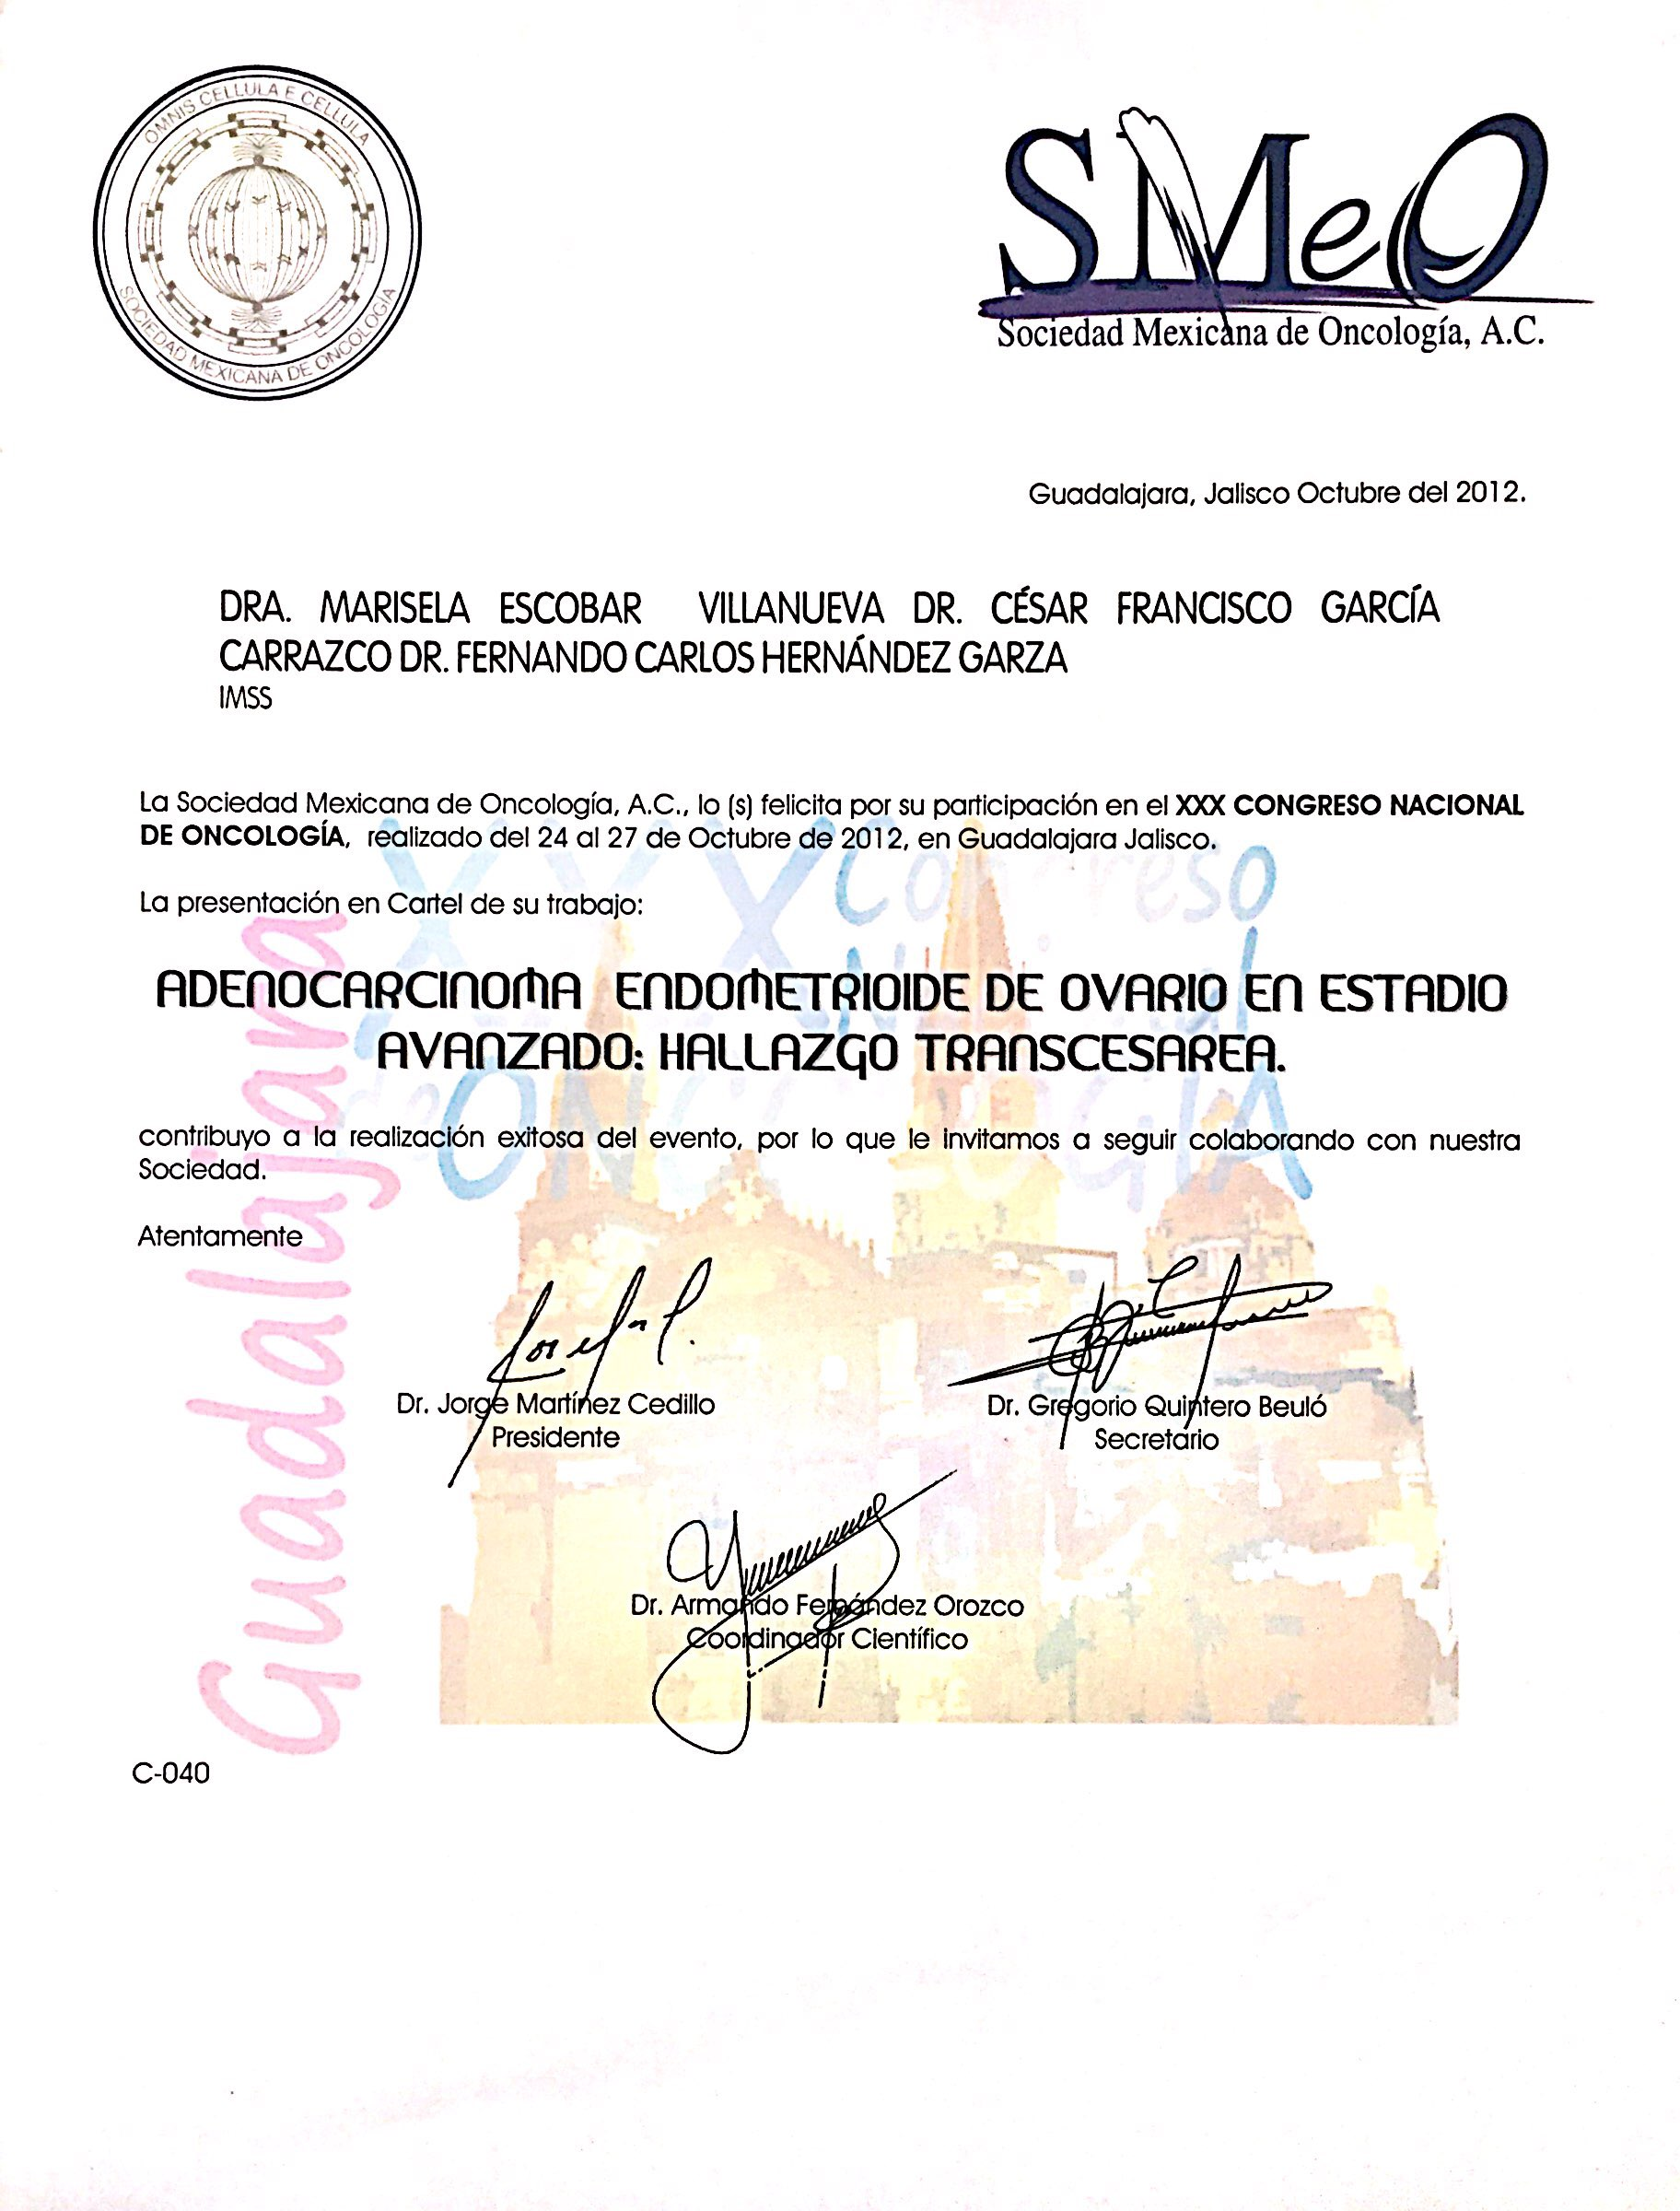 Nuevo doc 2018-02-20 11.21.39_27